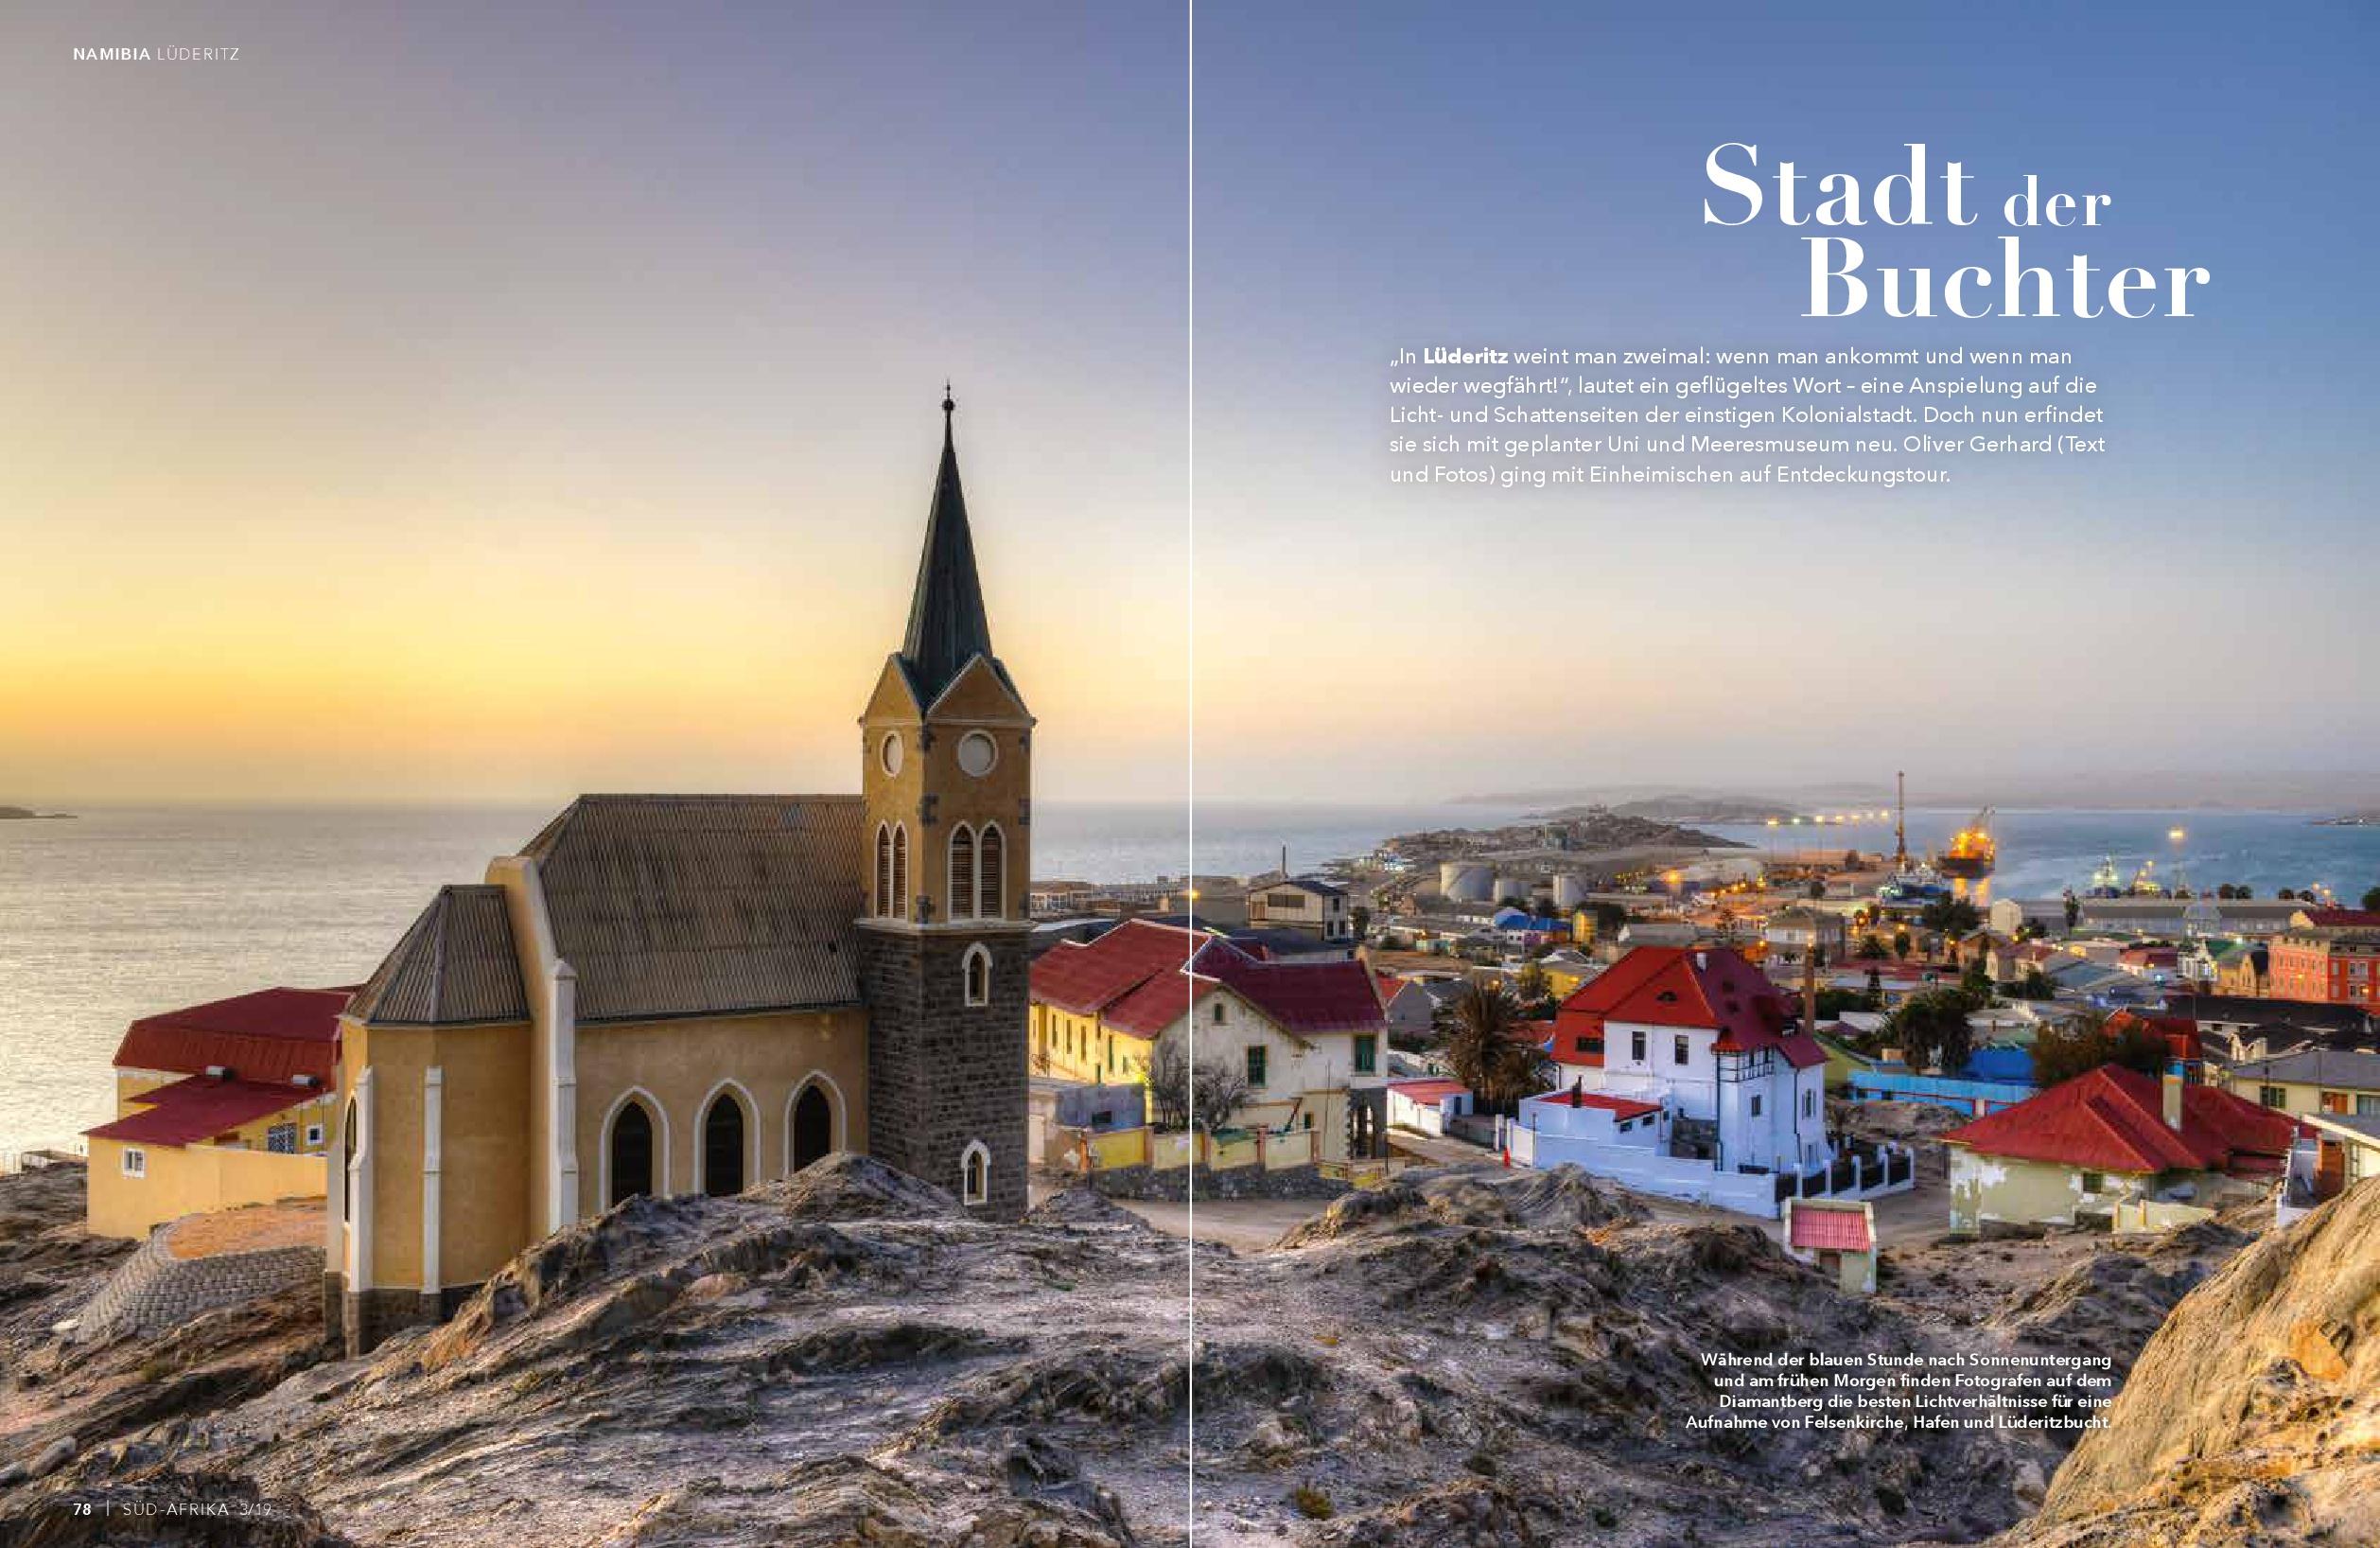 Lüderitz & beyond